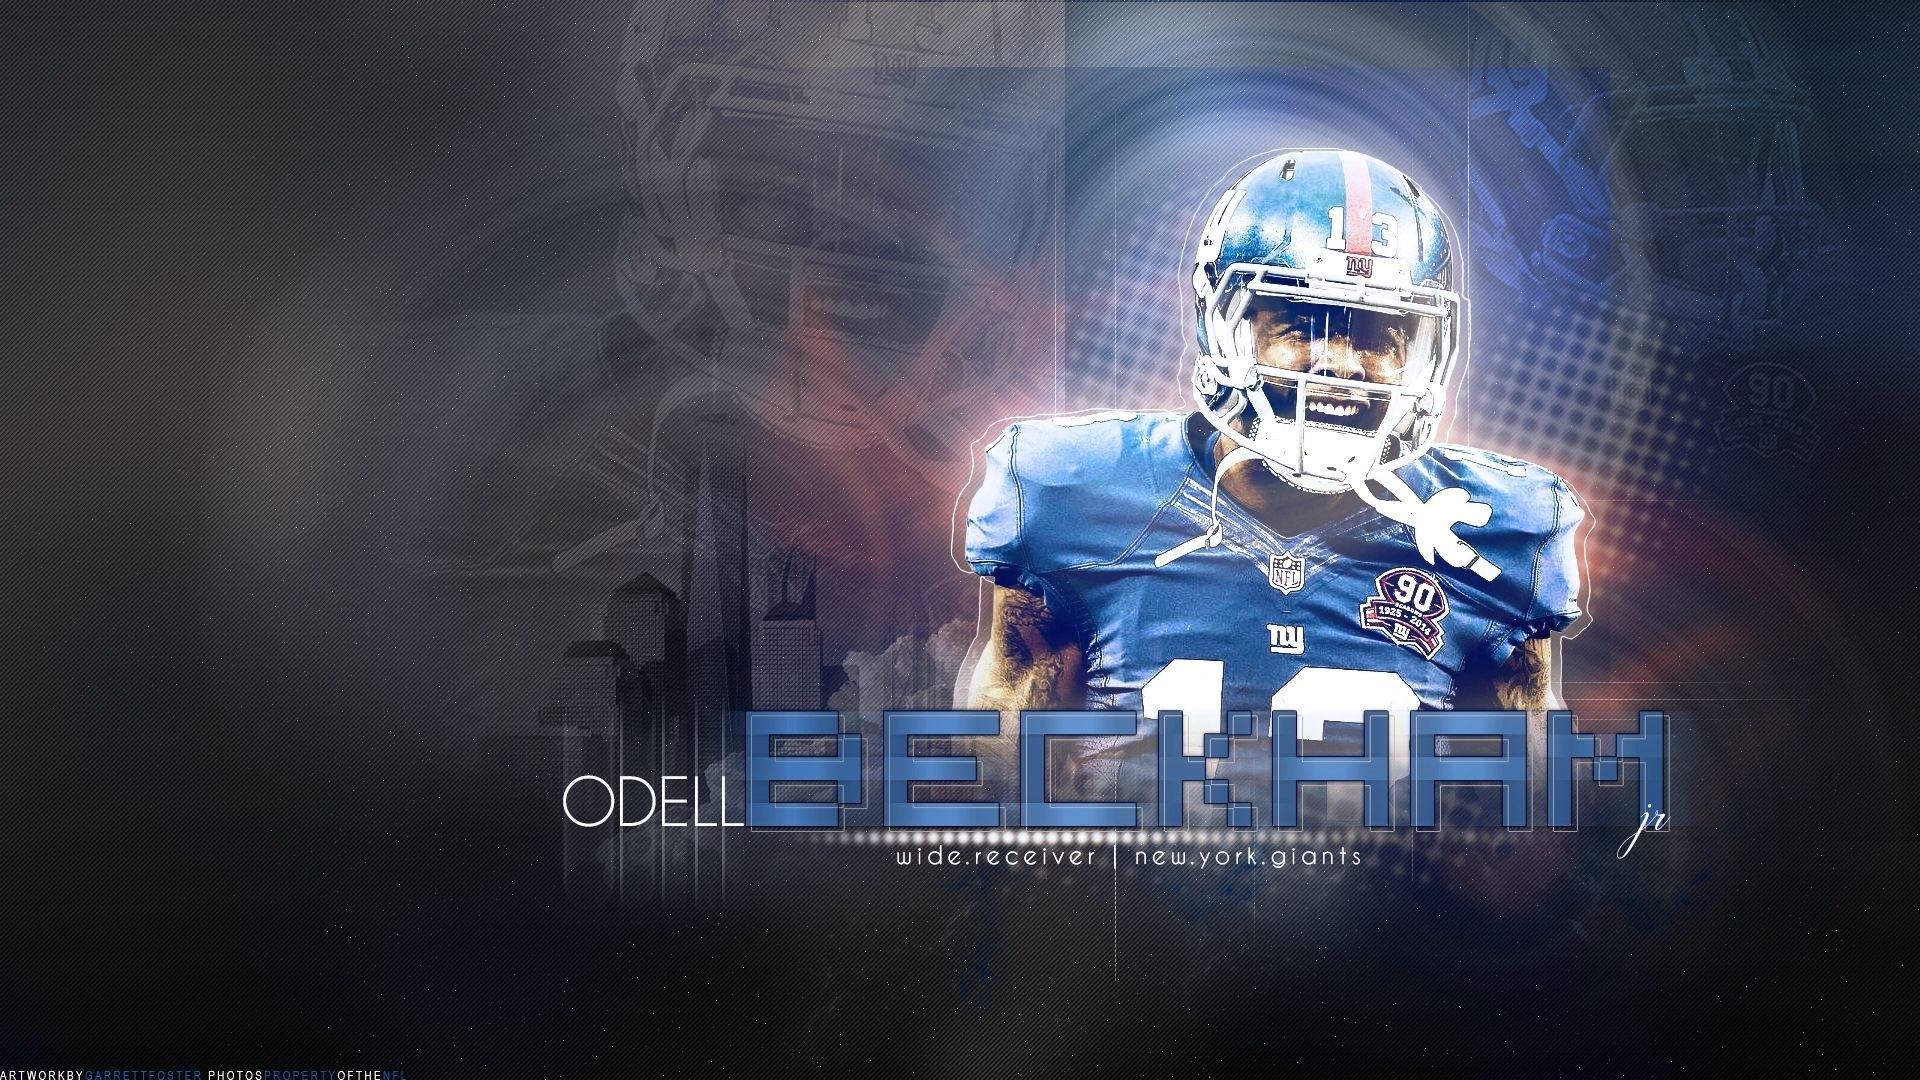 Odell Beckham Wallpaper theme